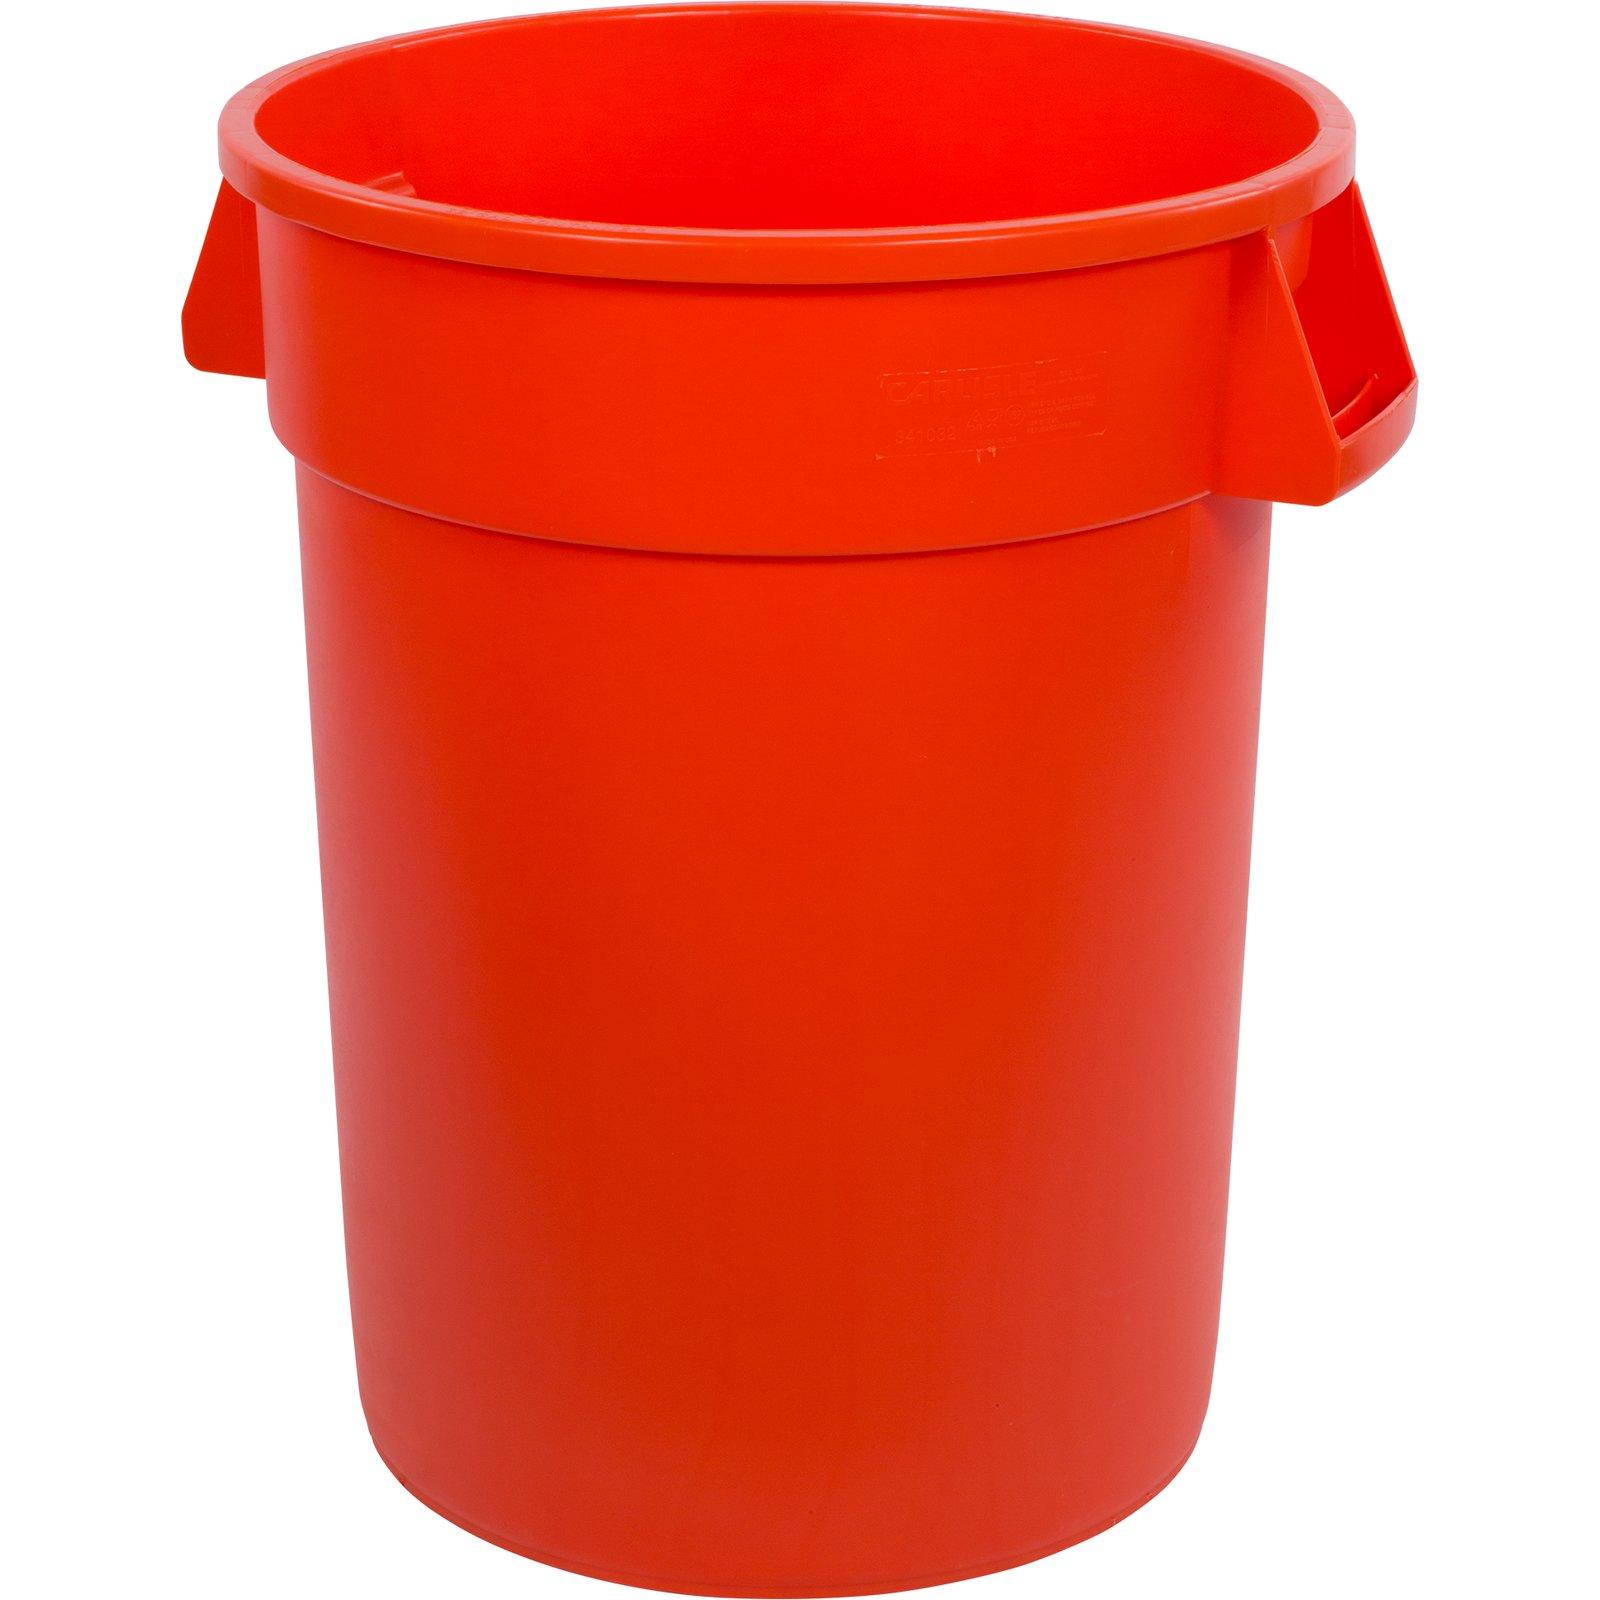 34103224 - Bronco™ Round Waste Bin Trash Container 32 Gallon - Orange  sc 1 st  Carlisle FoodService Products & 34103224 - Bronco™ Round Waste Bin Trash Container 32 Gallon ...